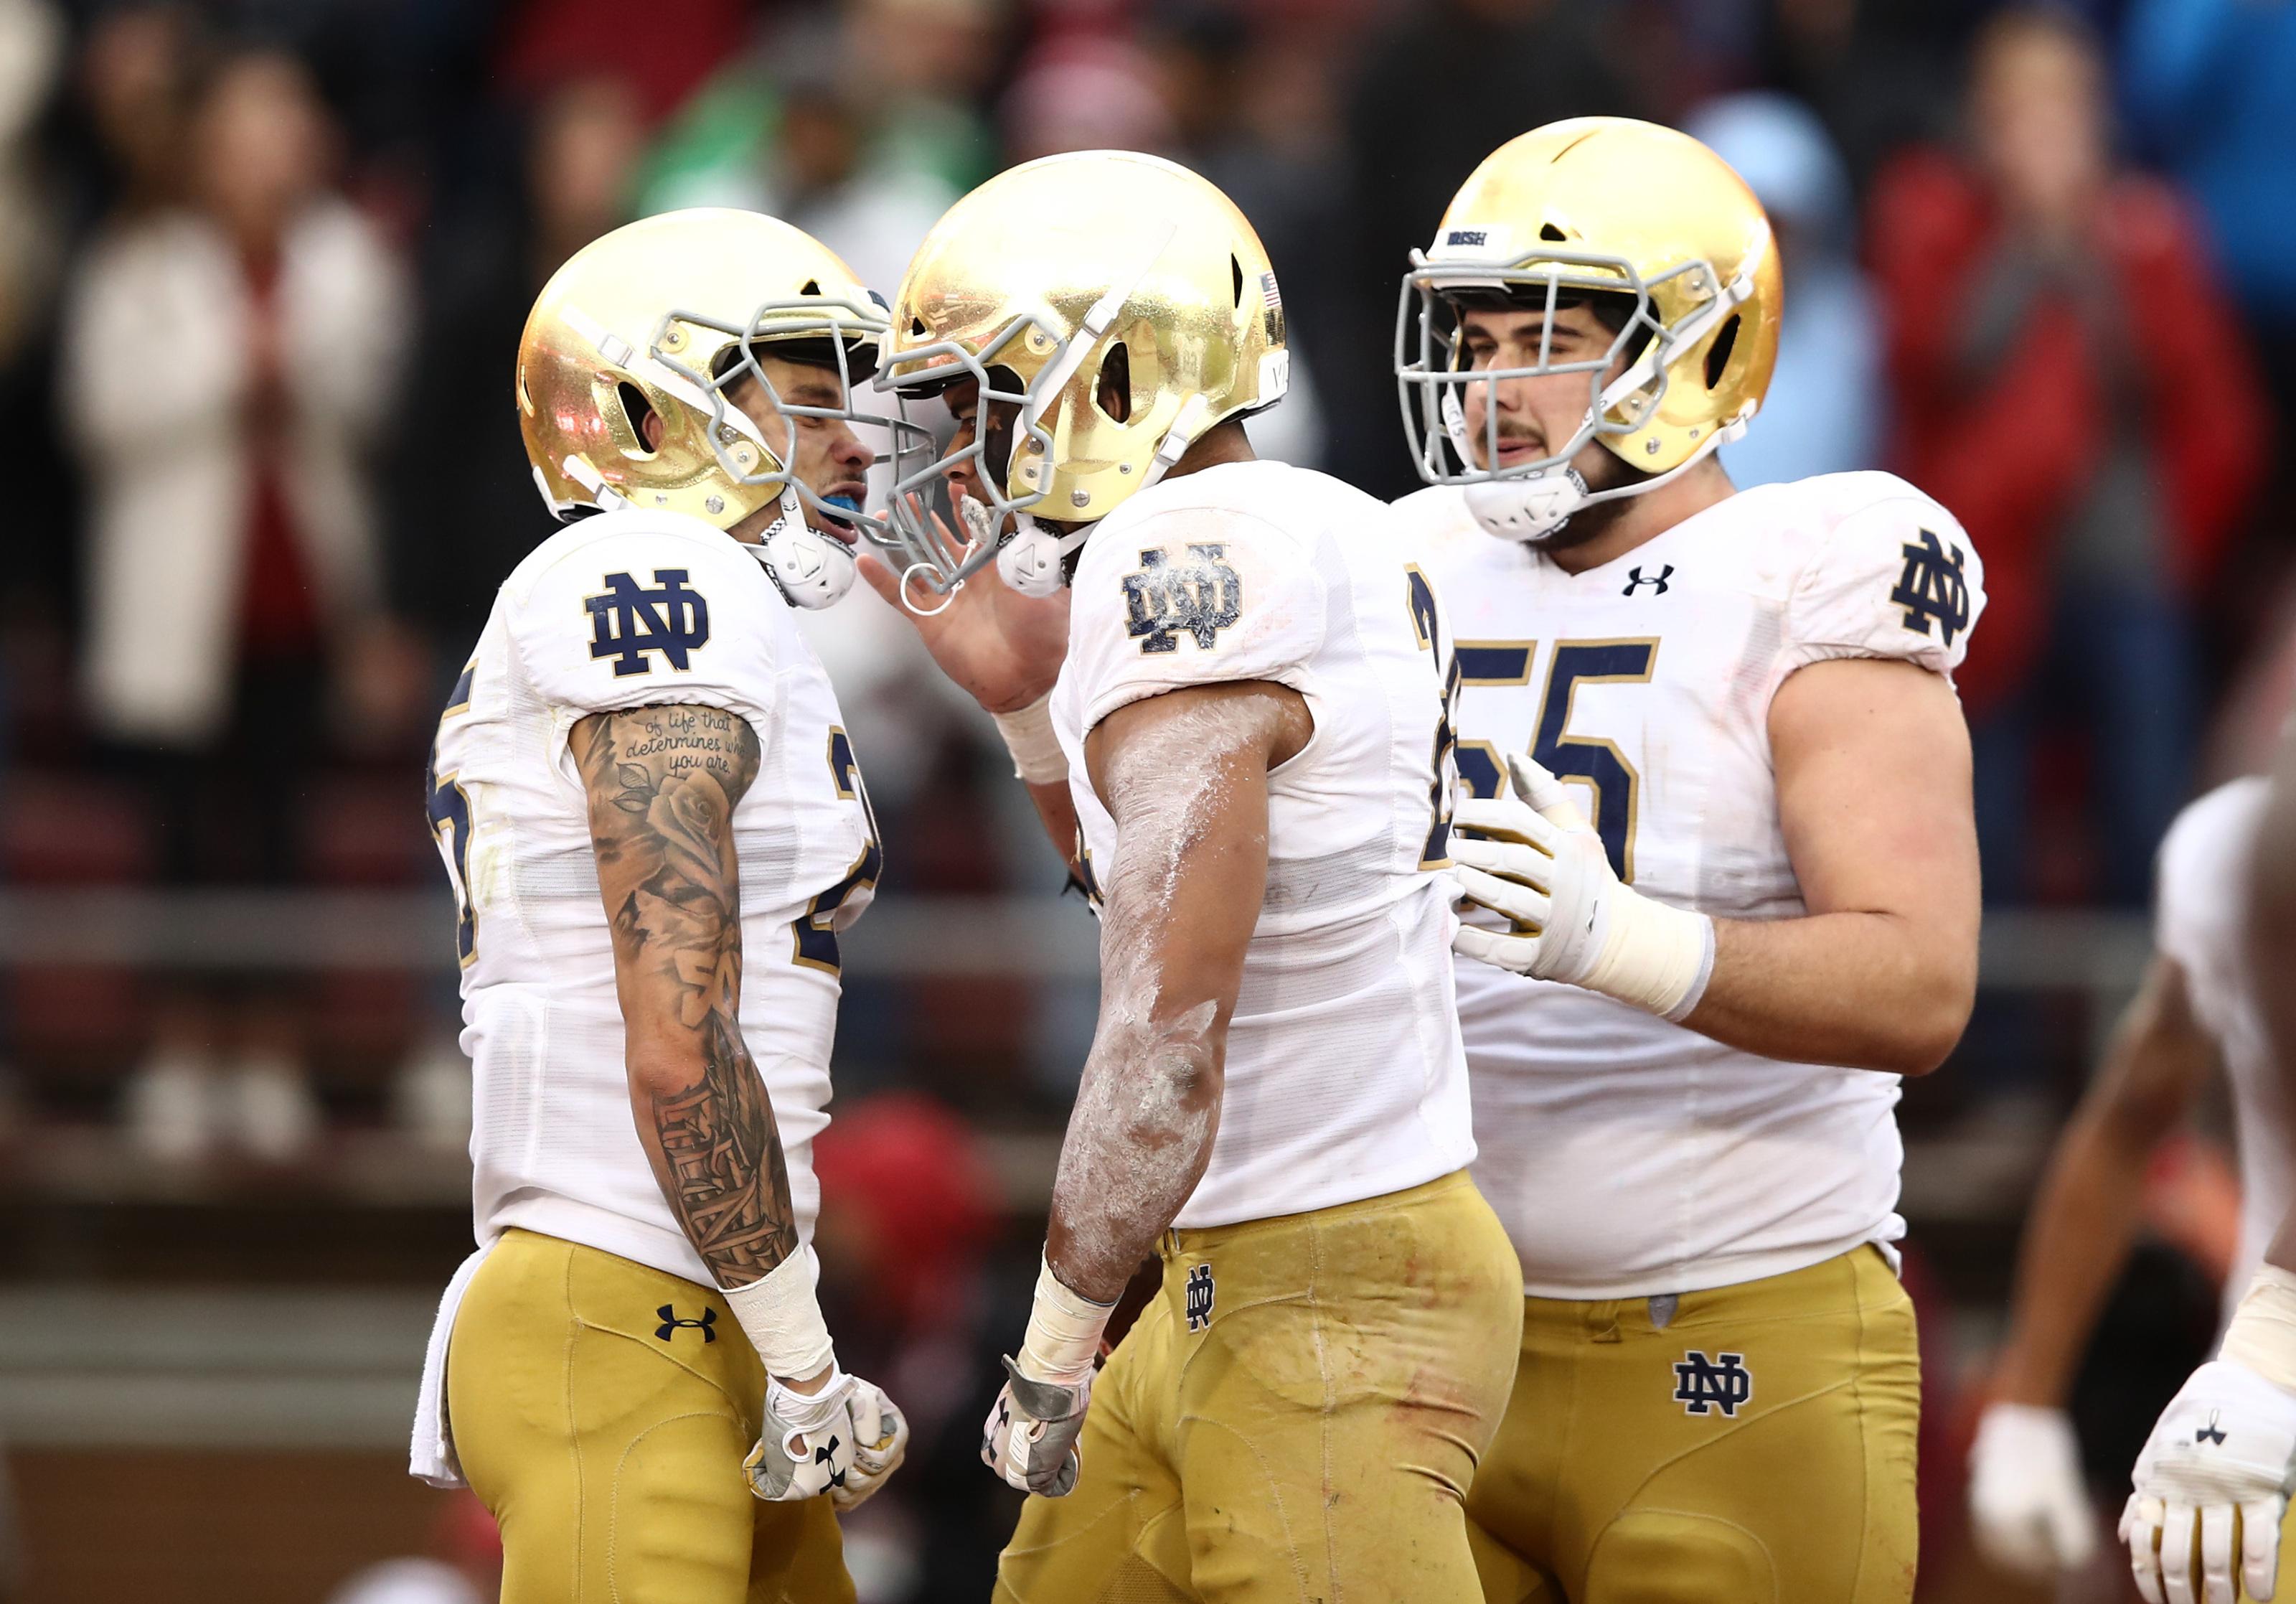 Notre Dame Football: 3 early storylines heading into 2020 season